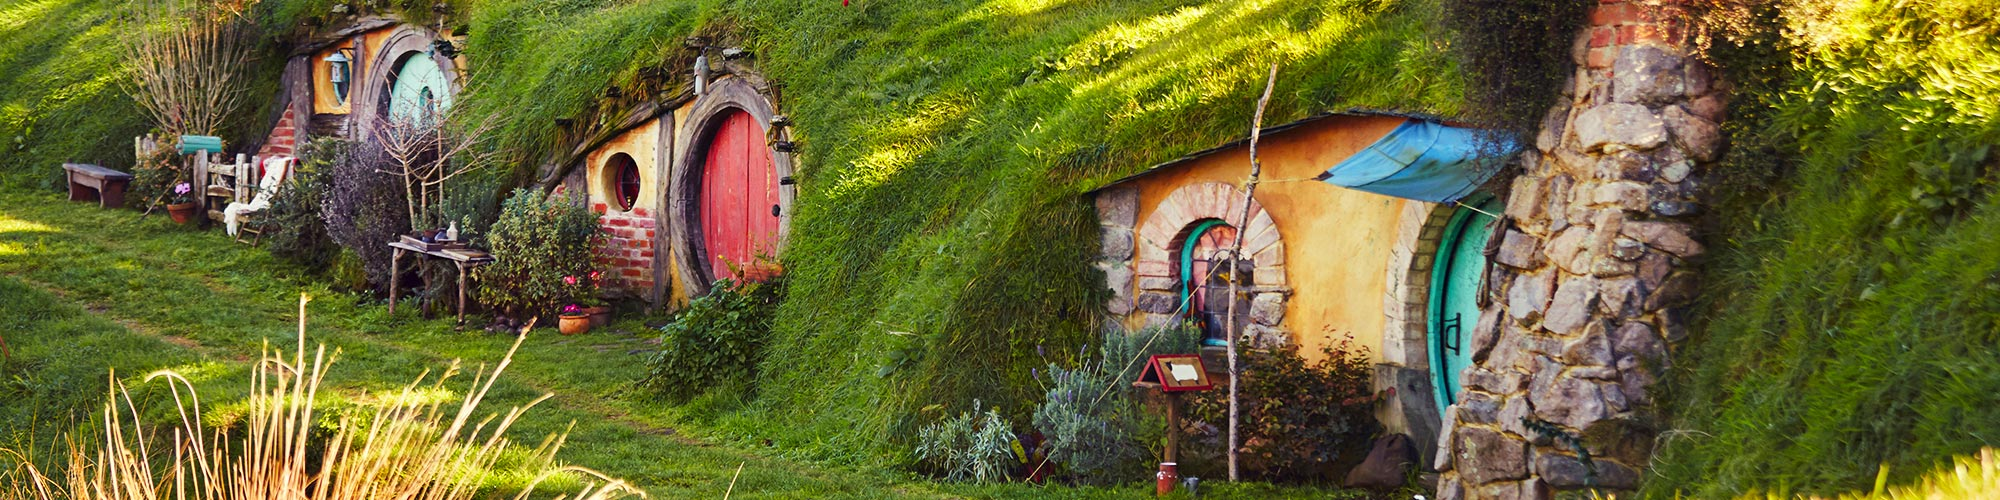 LoTR The Hobbit Tours New Zealand Header